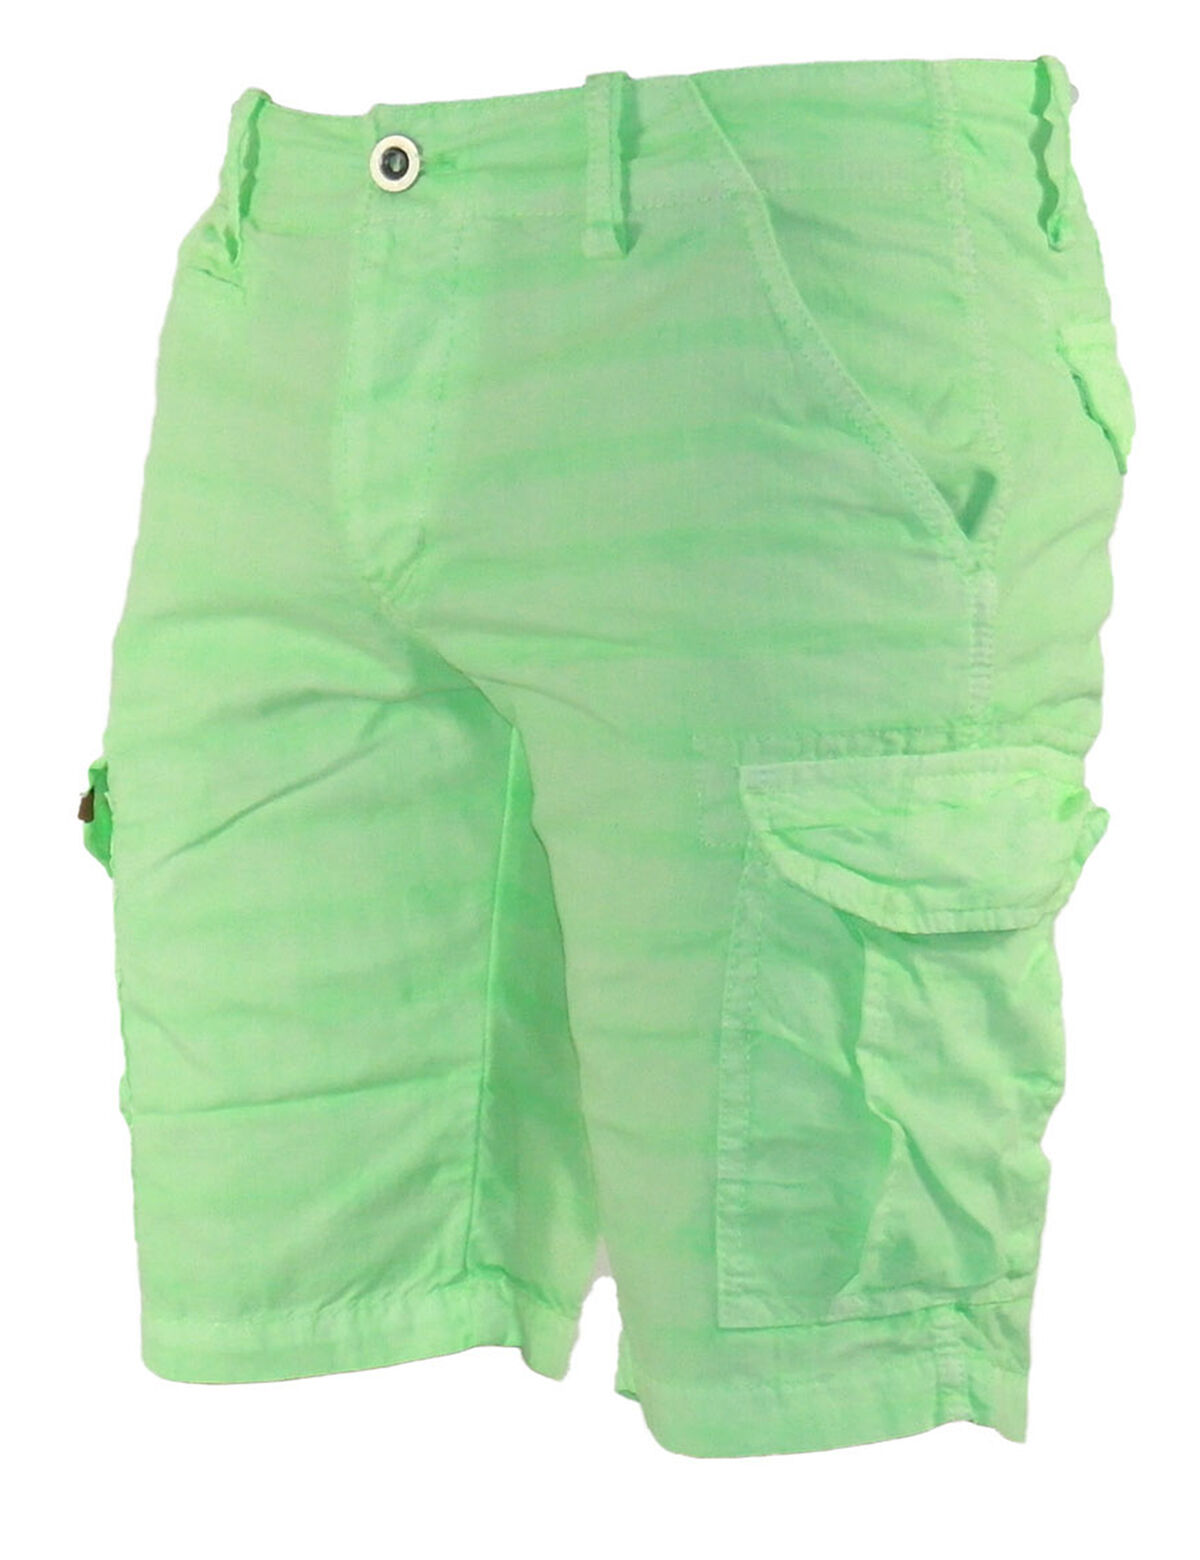 852bc99b397a43 Herren Jeans kurze Hose lange Cargo Shorts Bermuda Caprihose K010 1 ...